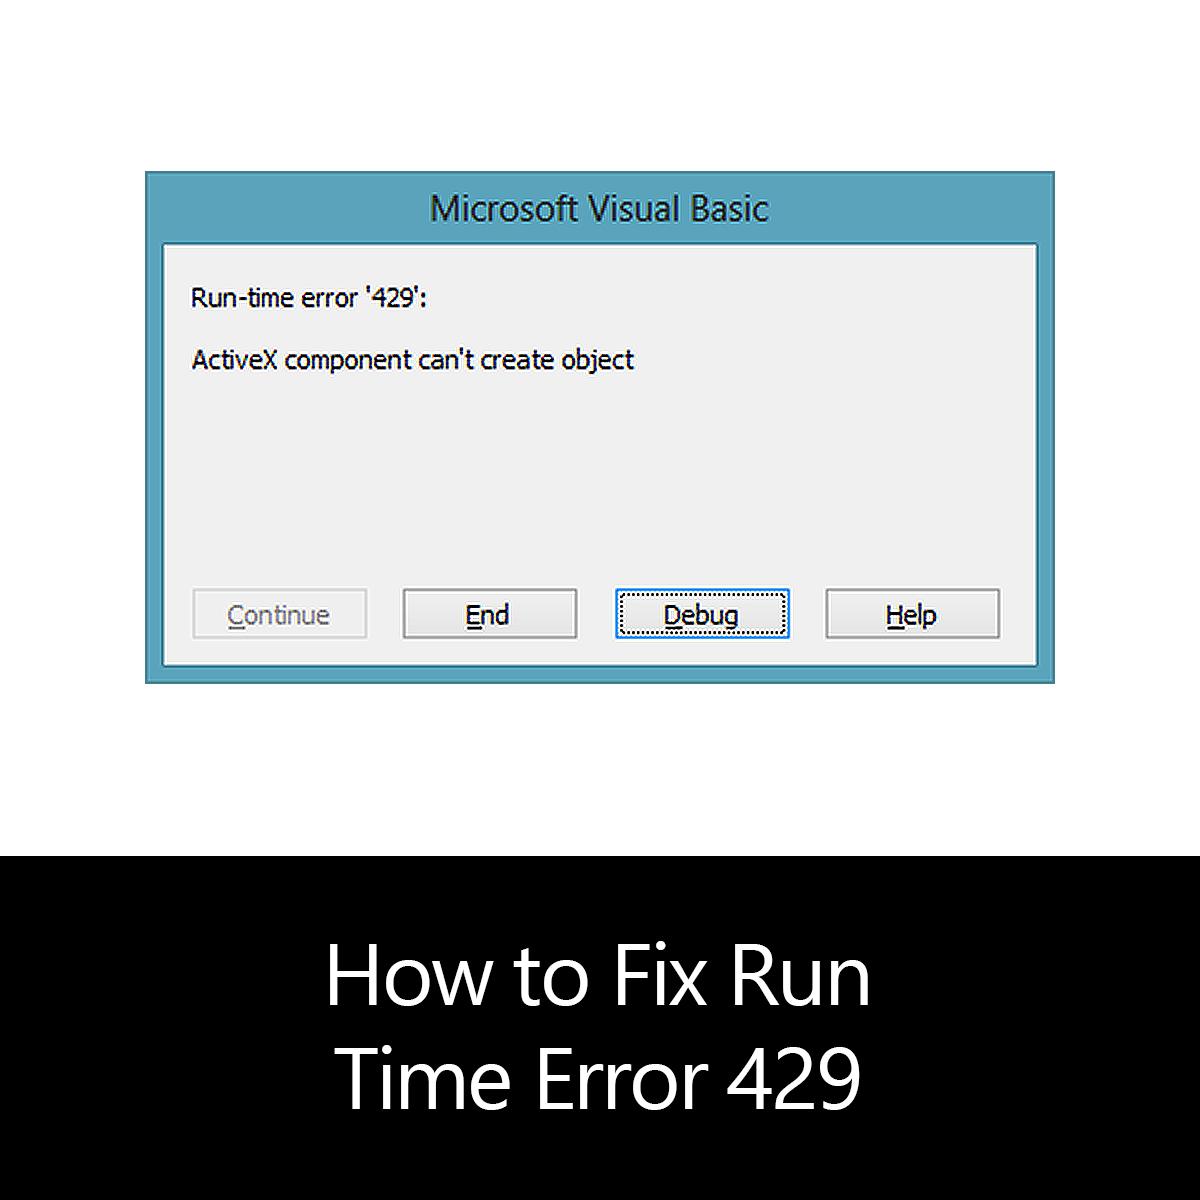 How to Fix Run Time Error 429